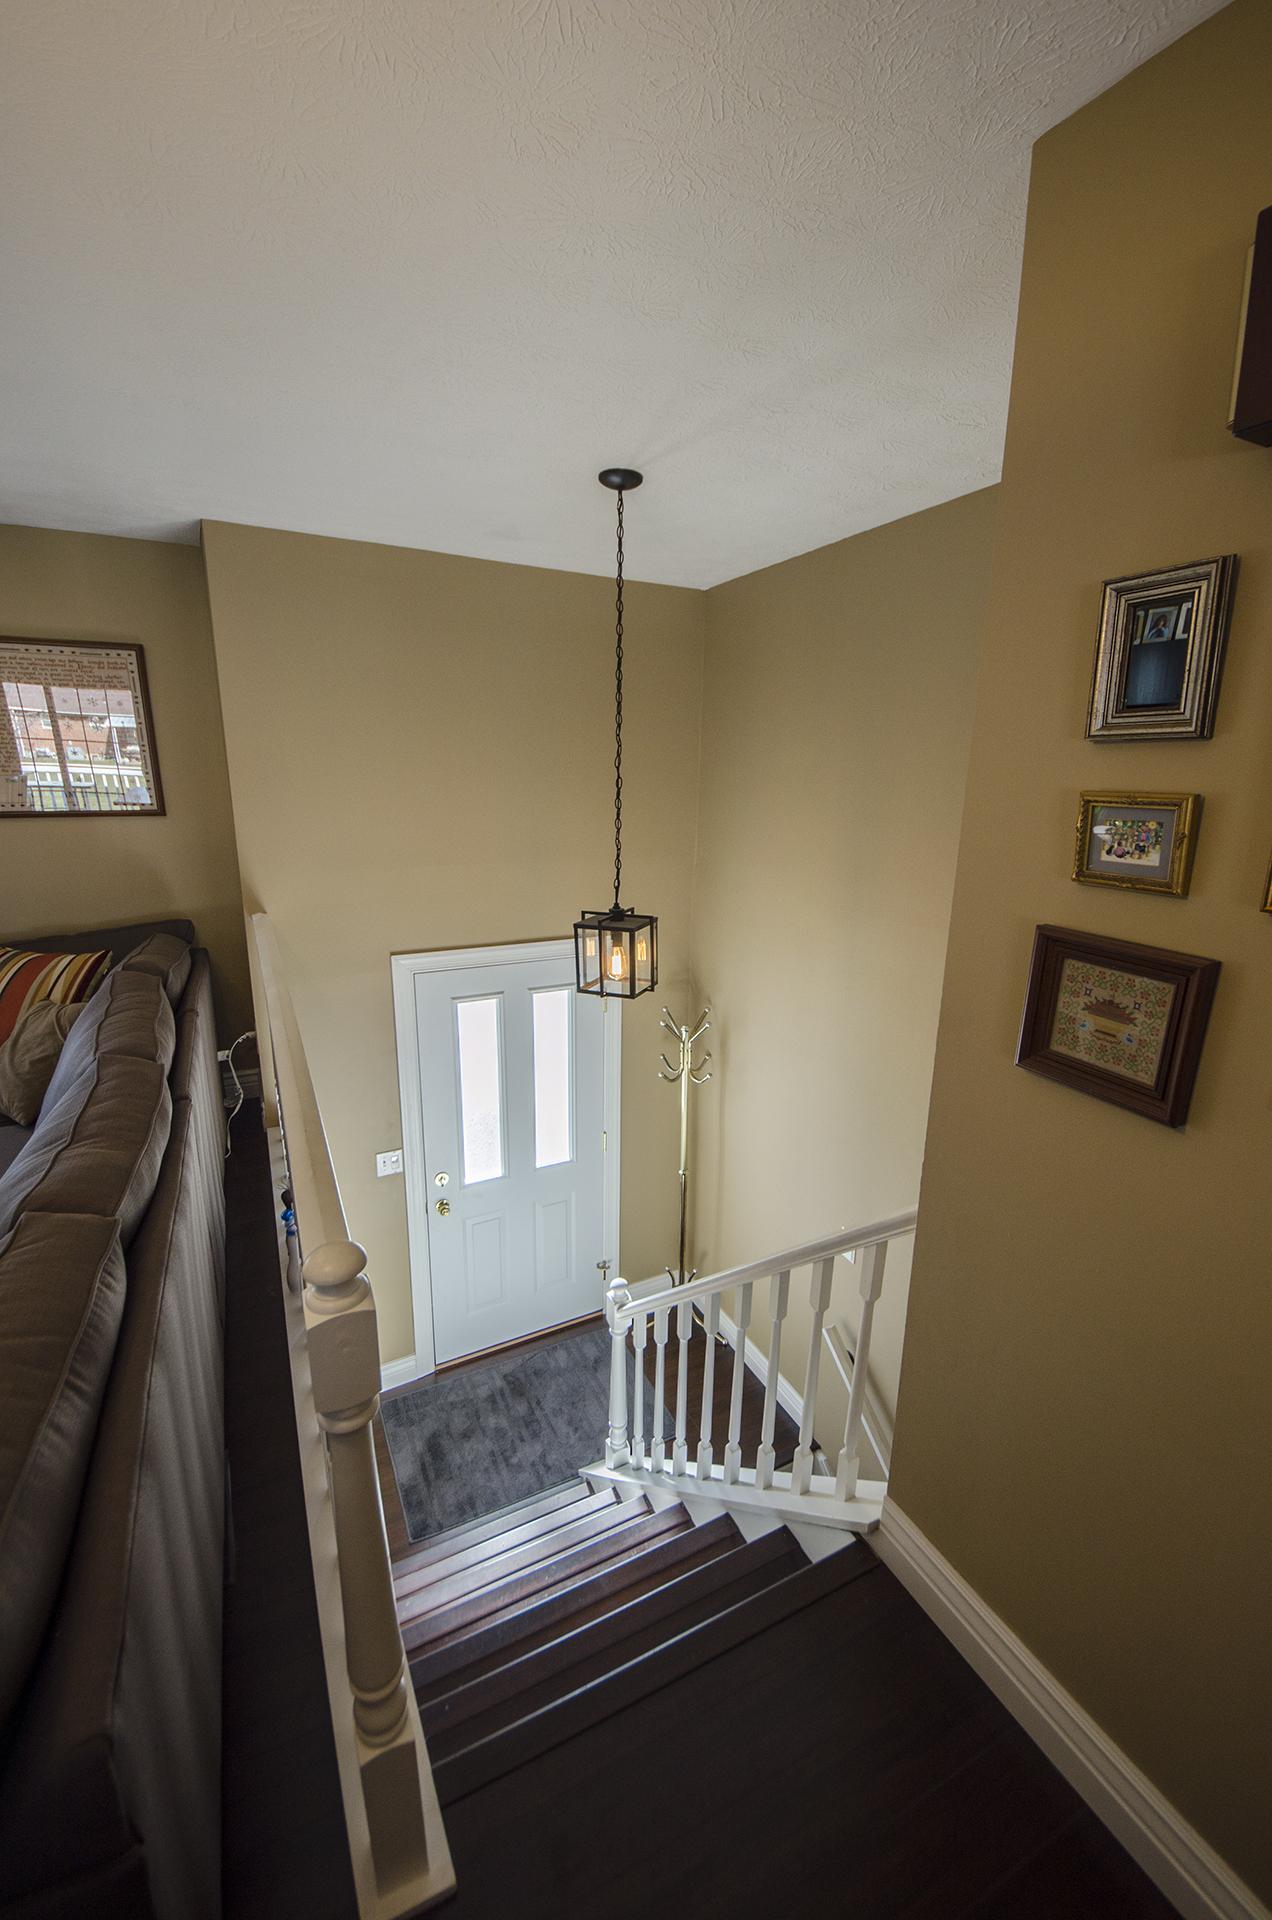 design homes dayton ohio | photo home design